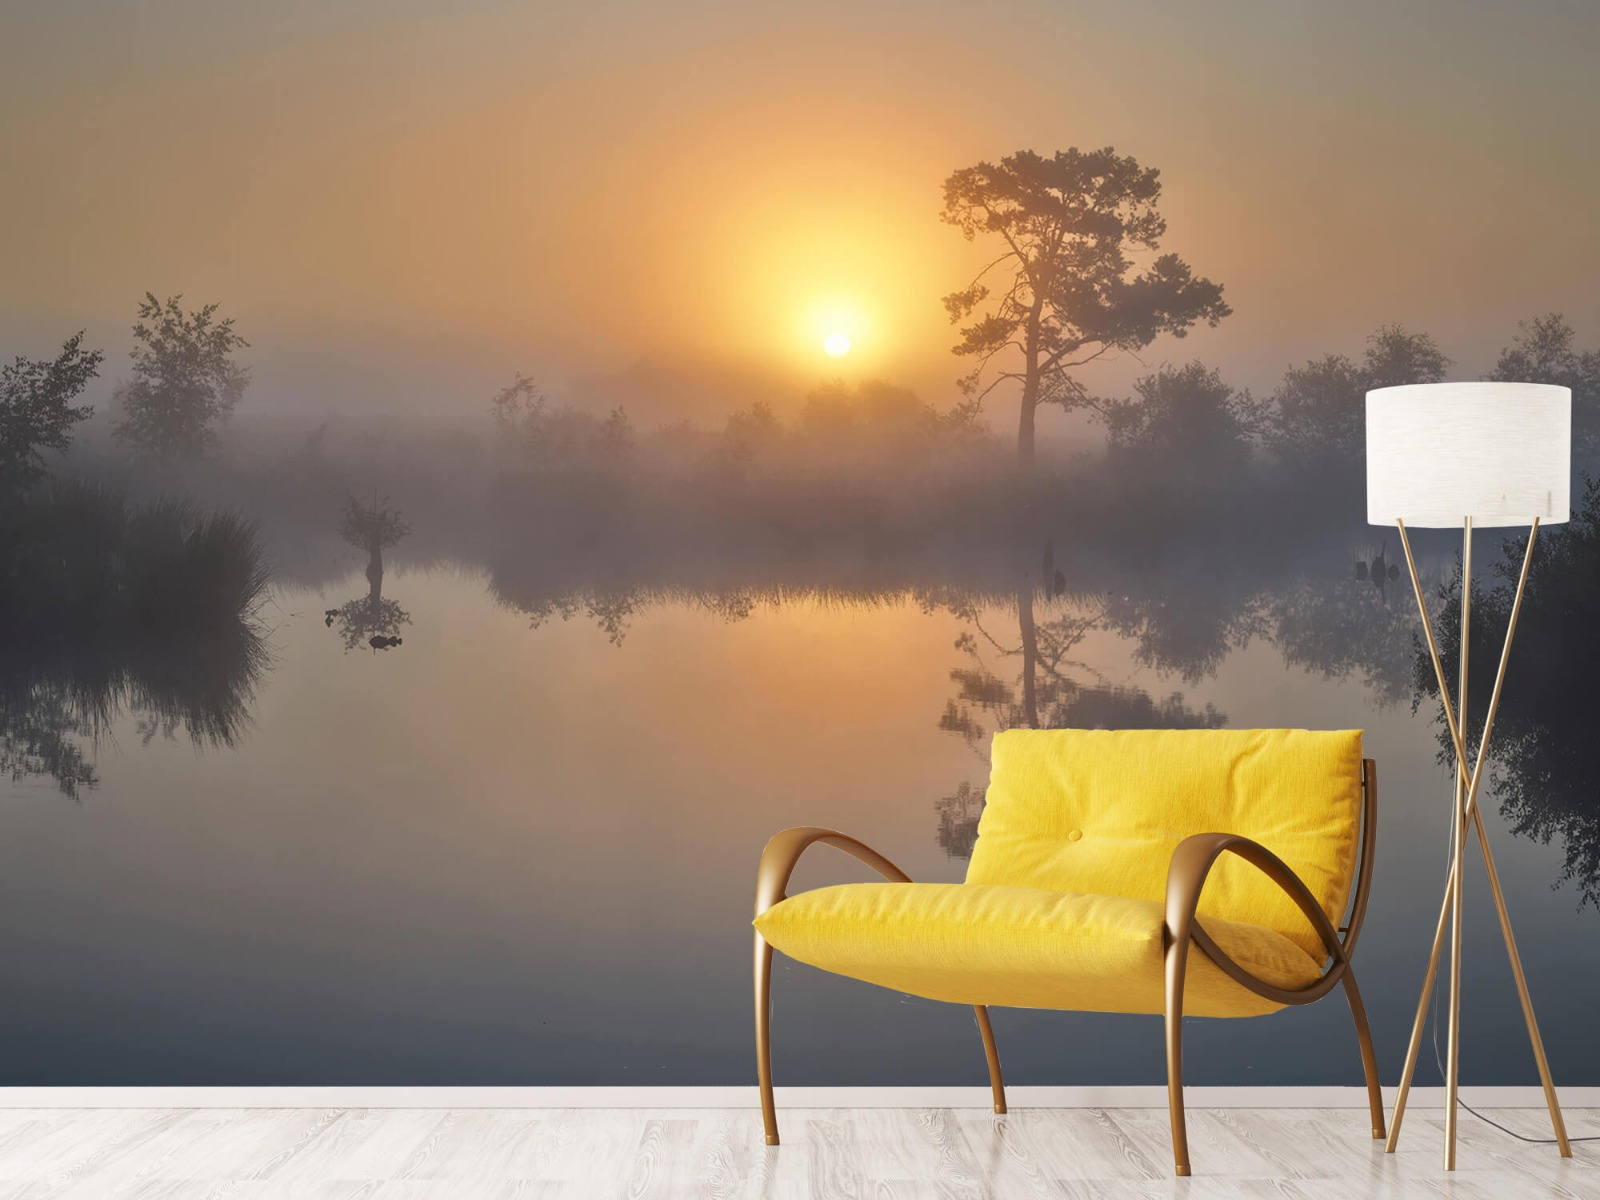 Natuur - Mistige zonsopkomst 11